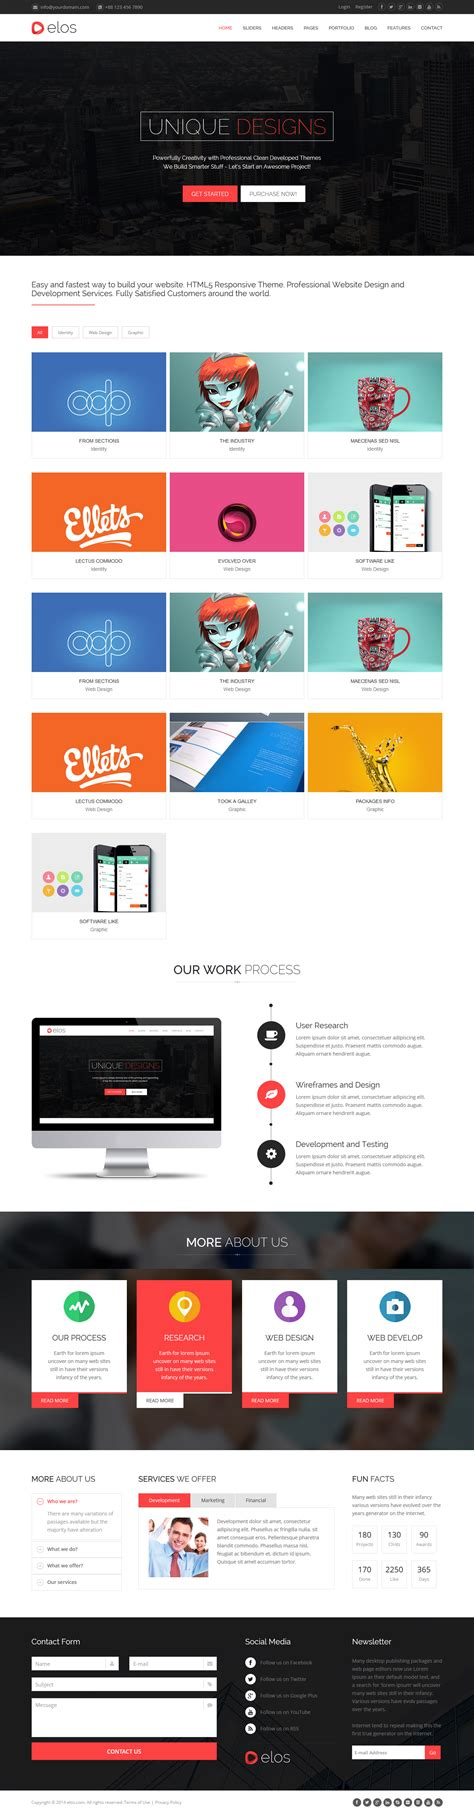 runek multipurpose and responsive joomla theme by elos responsive multipurpose joomla theme by